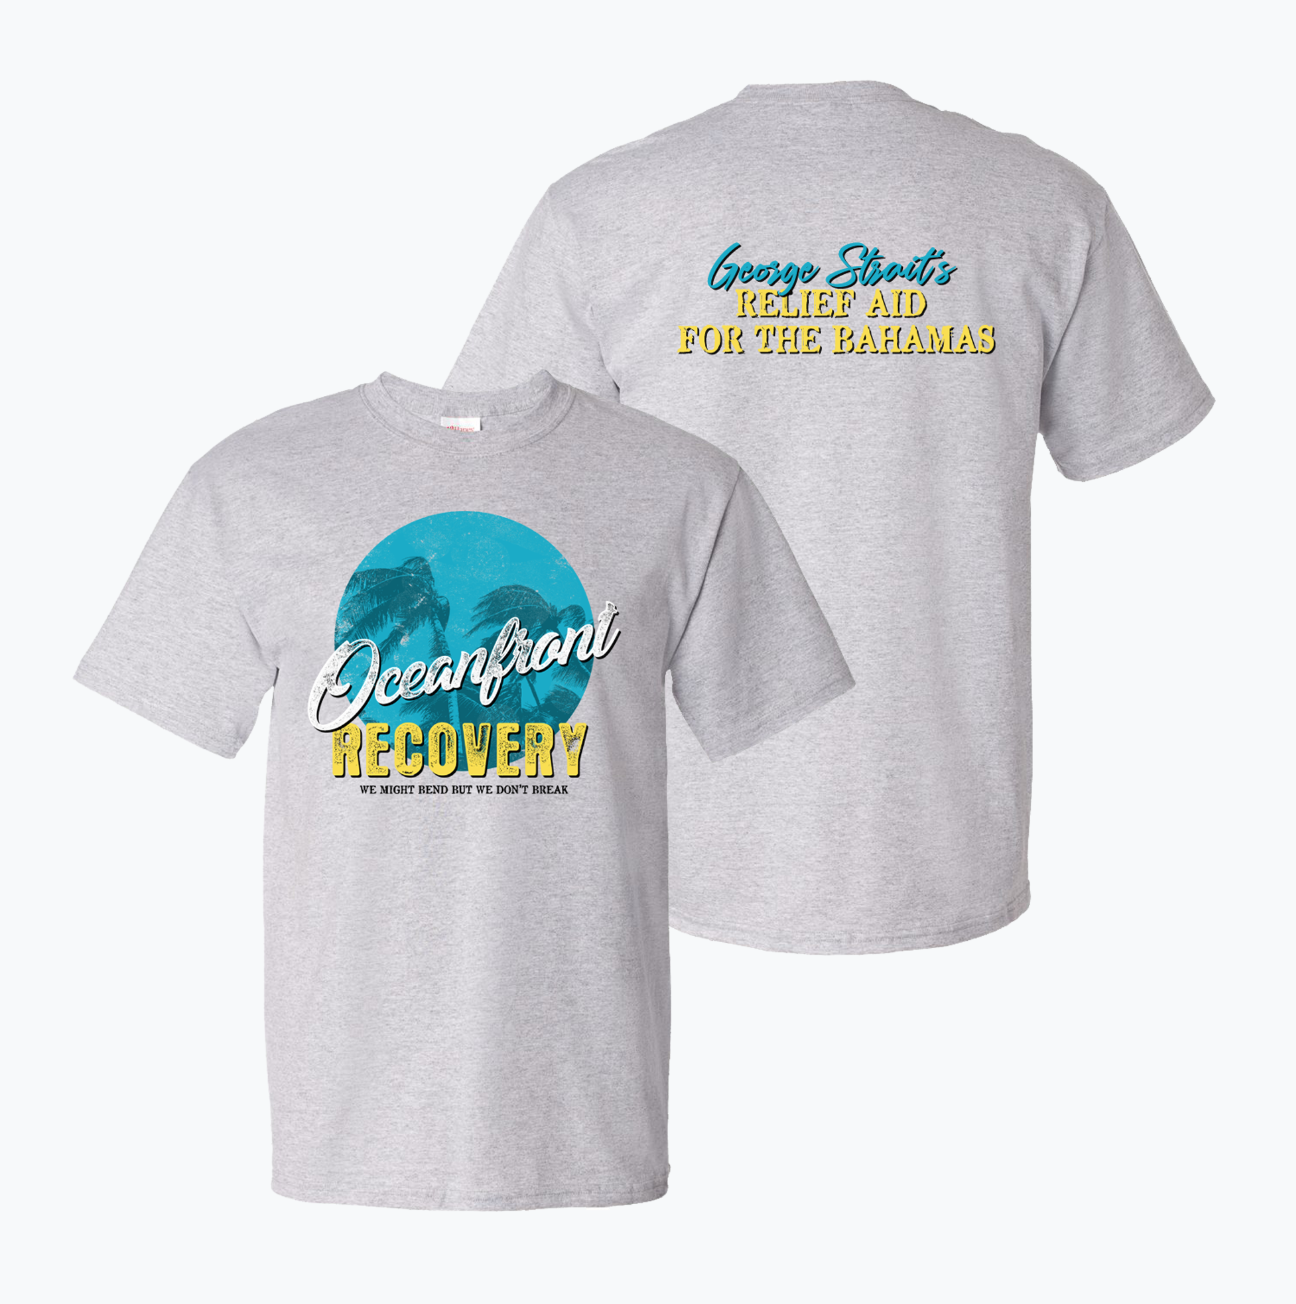 New George Strait T-Shirts Benefit Bahamas Hurricane ...